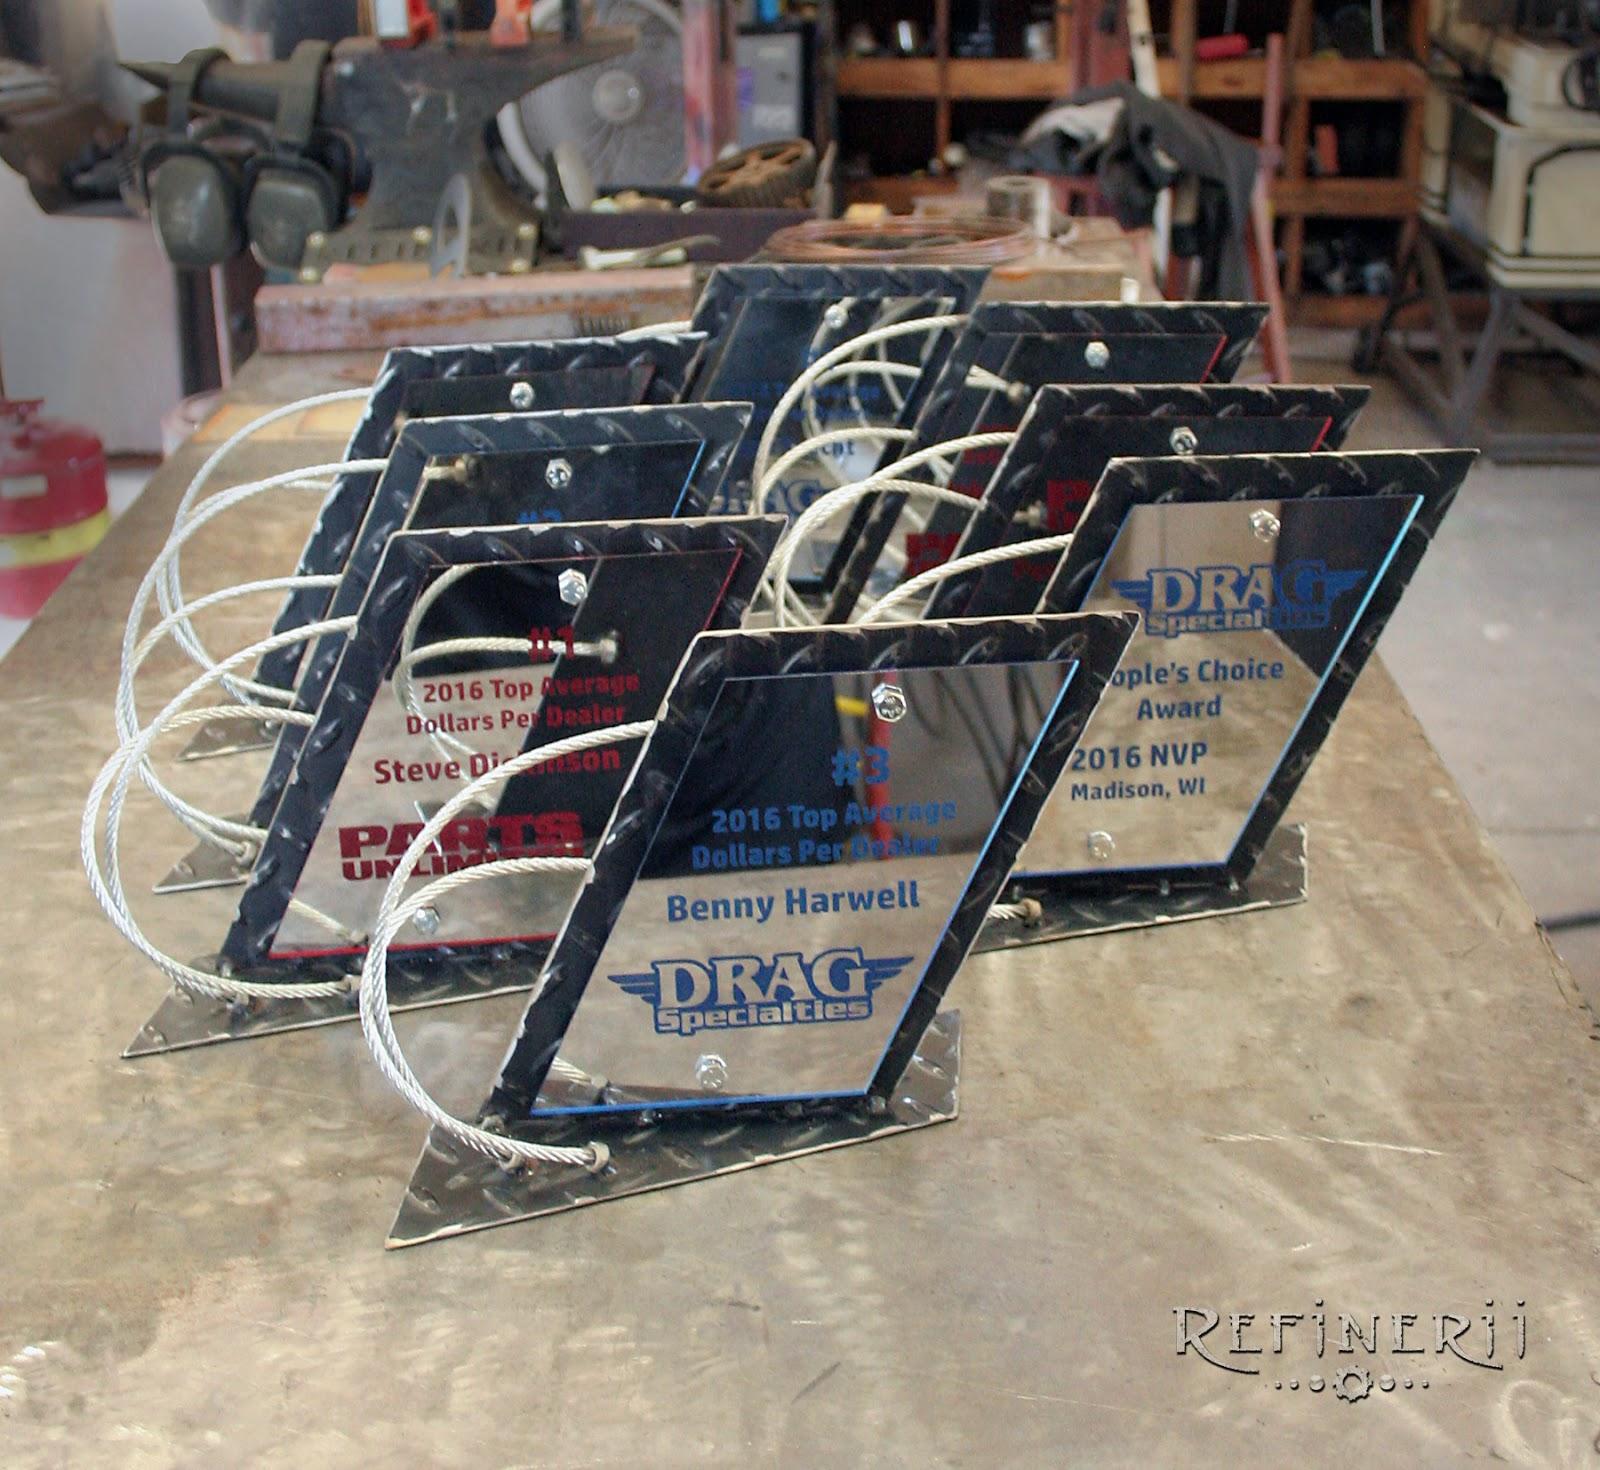 Refinerii Studios: Drag Race Custom Trophies with Diamond Plate